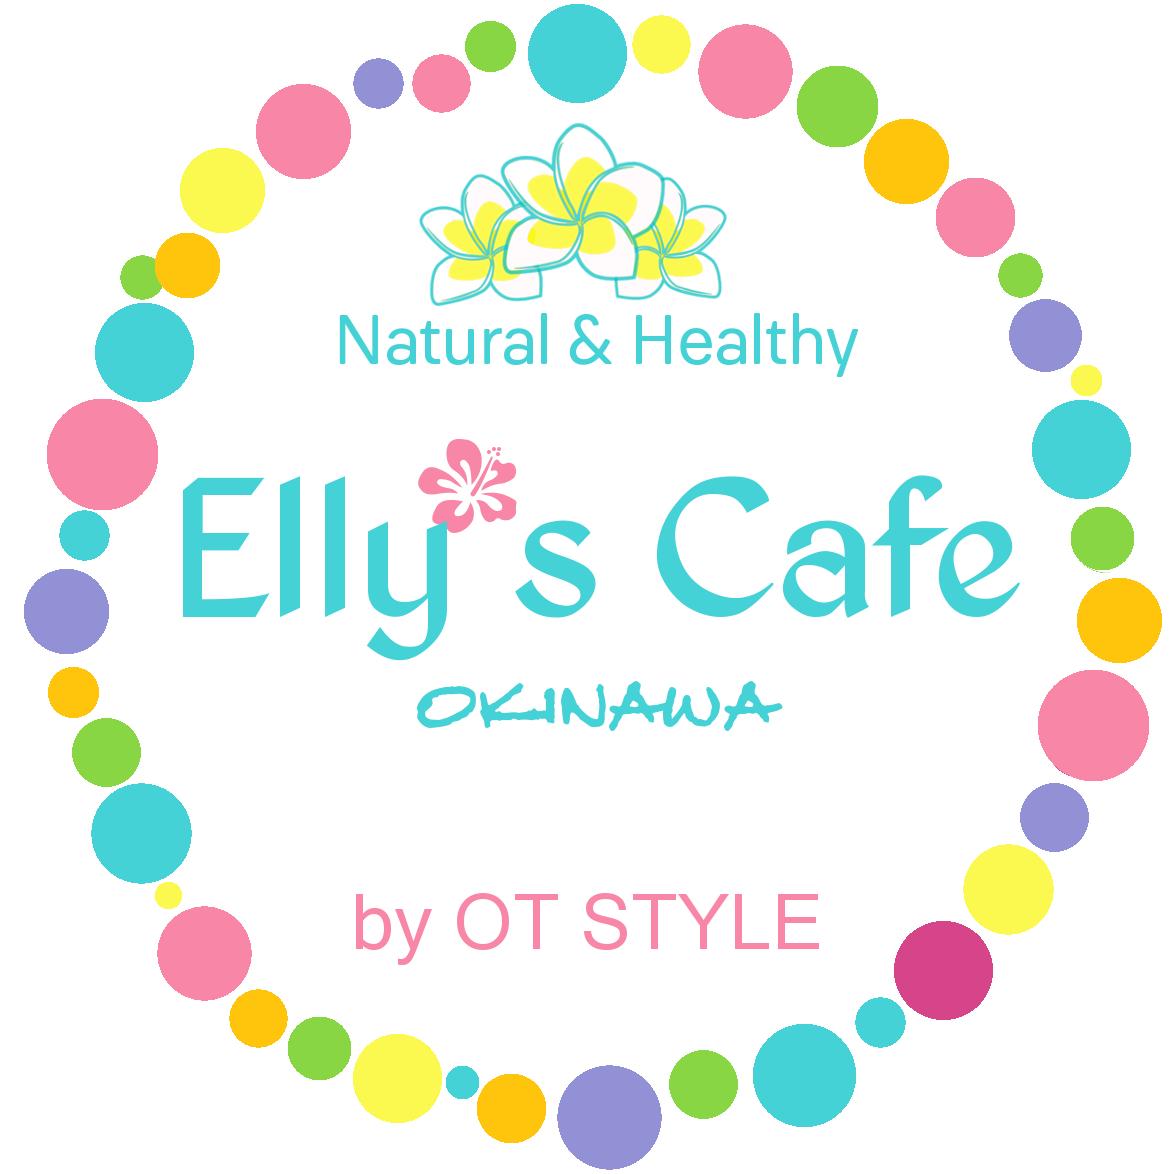 Elly's Cafe